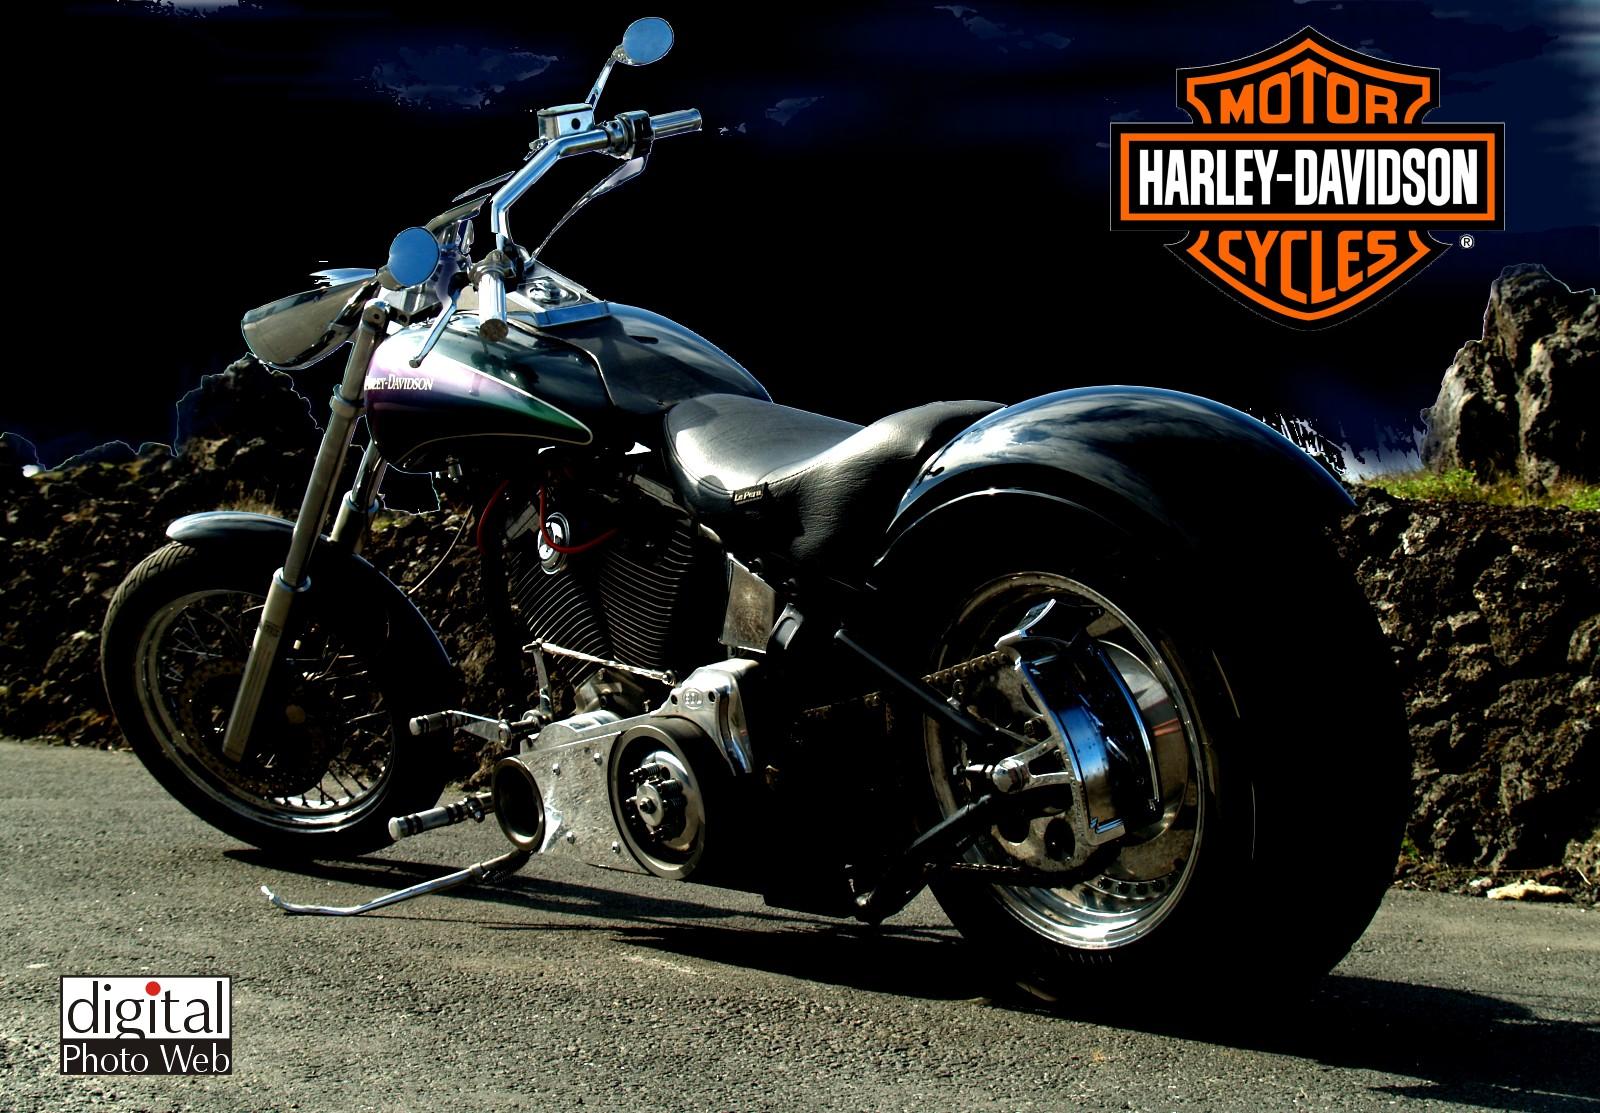 Motor Sports Hd Wallpaper: Gambar Gambar Motor Harley Davidson